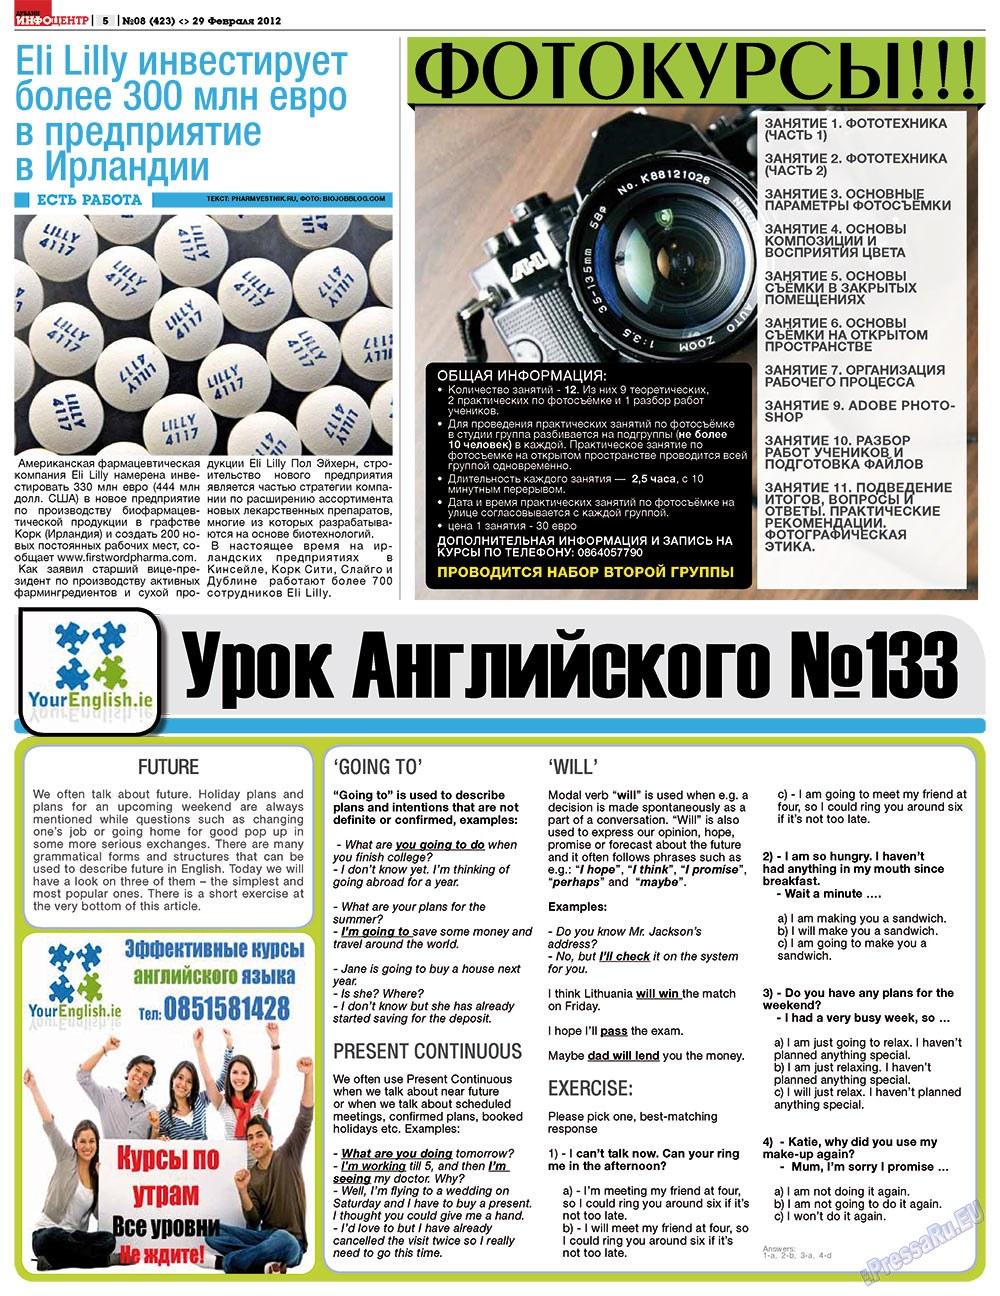 Дублин инфоцентр (газета). 2012 год, номер 8, стр. 5